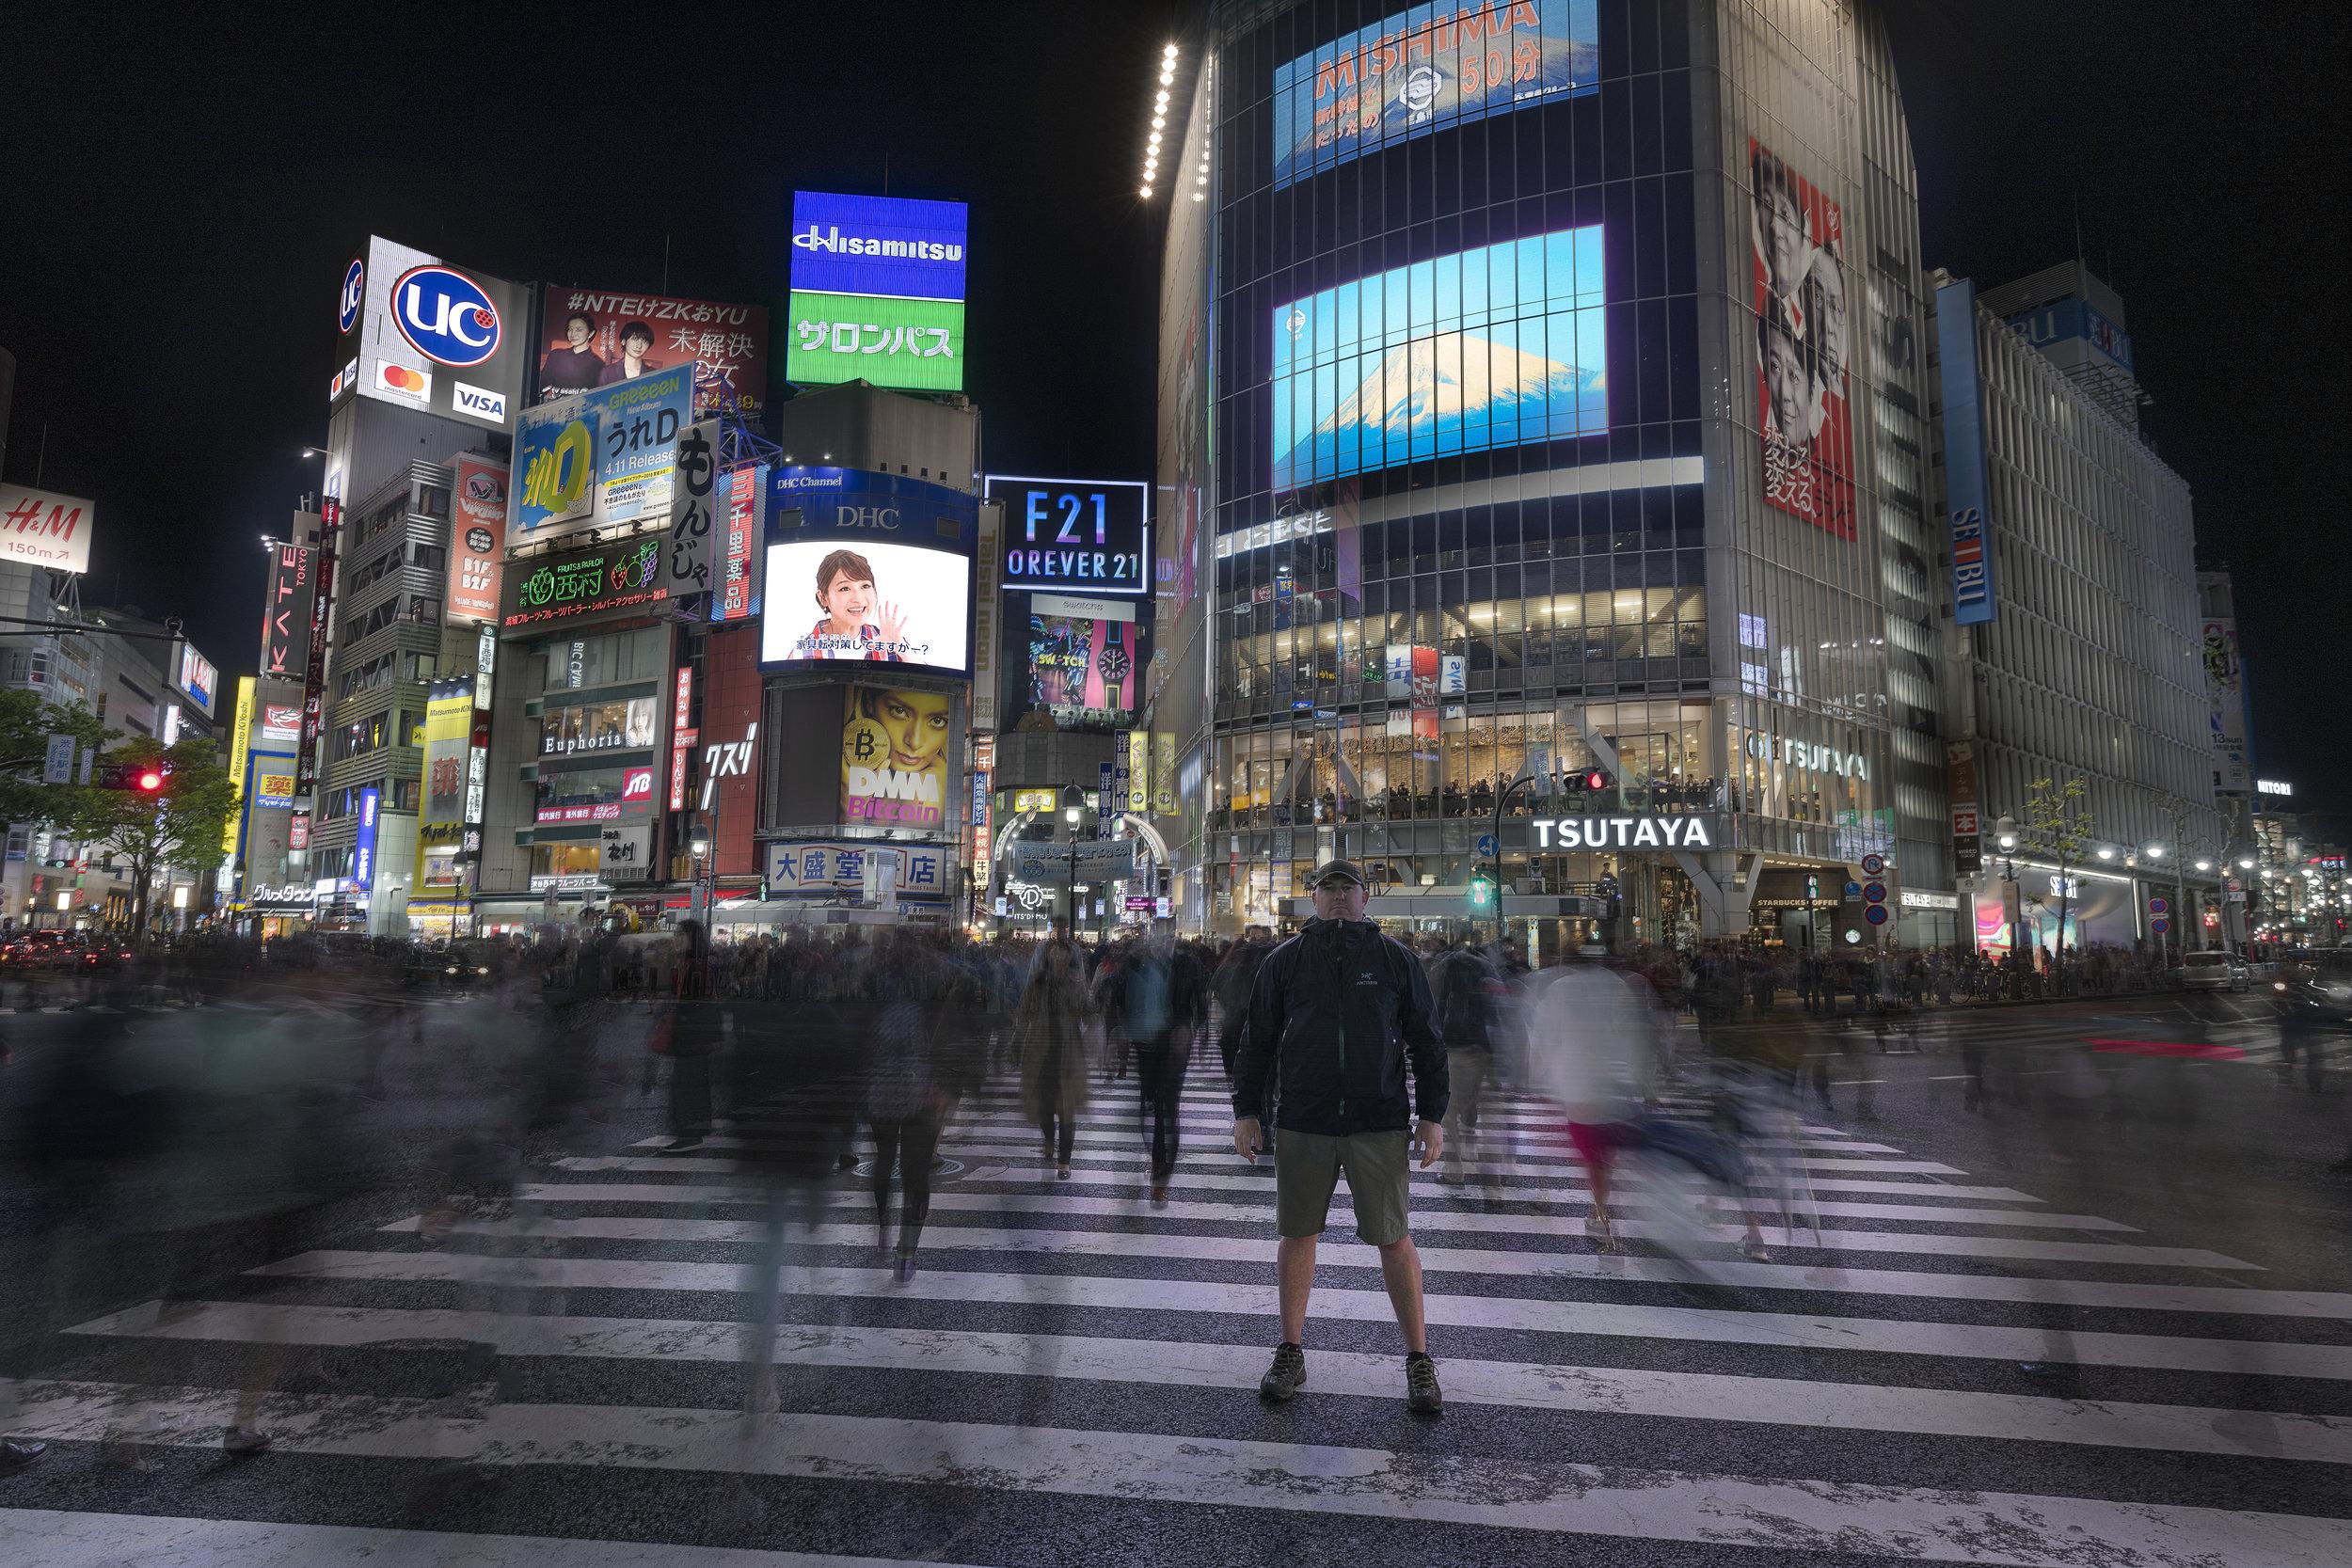 Shibuya crossing - Tokyo, Japan.